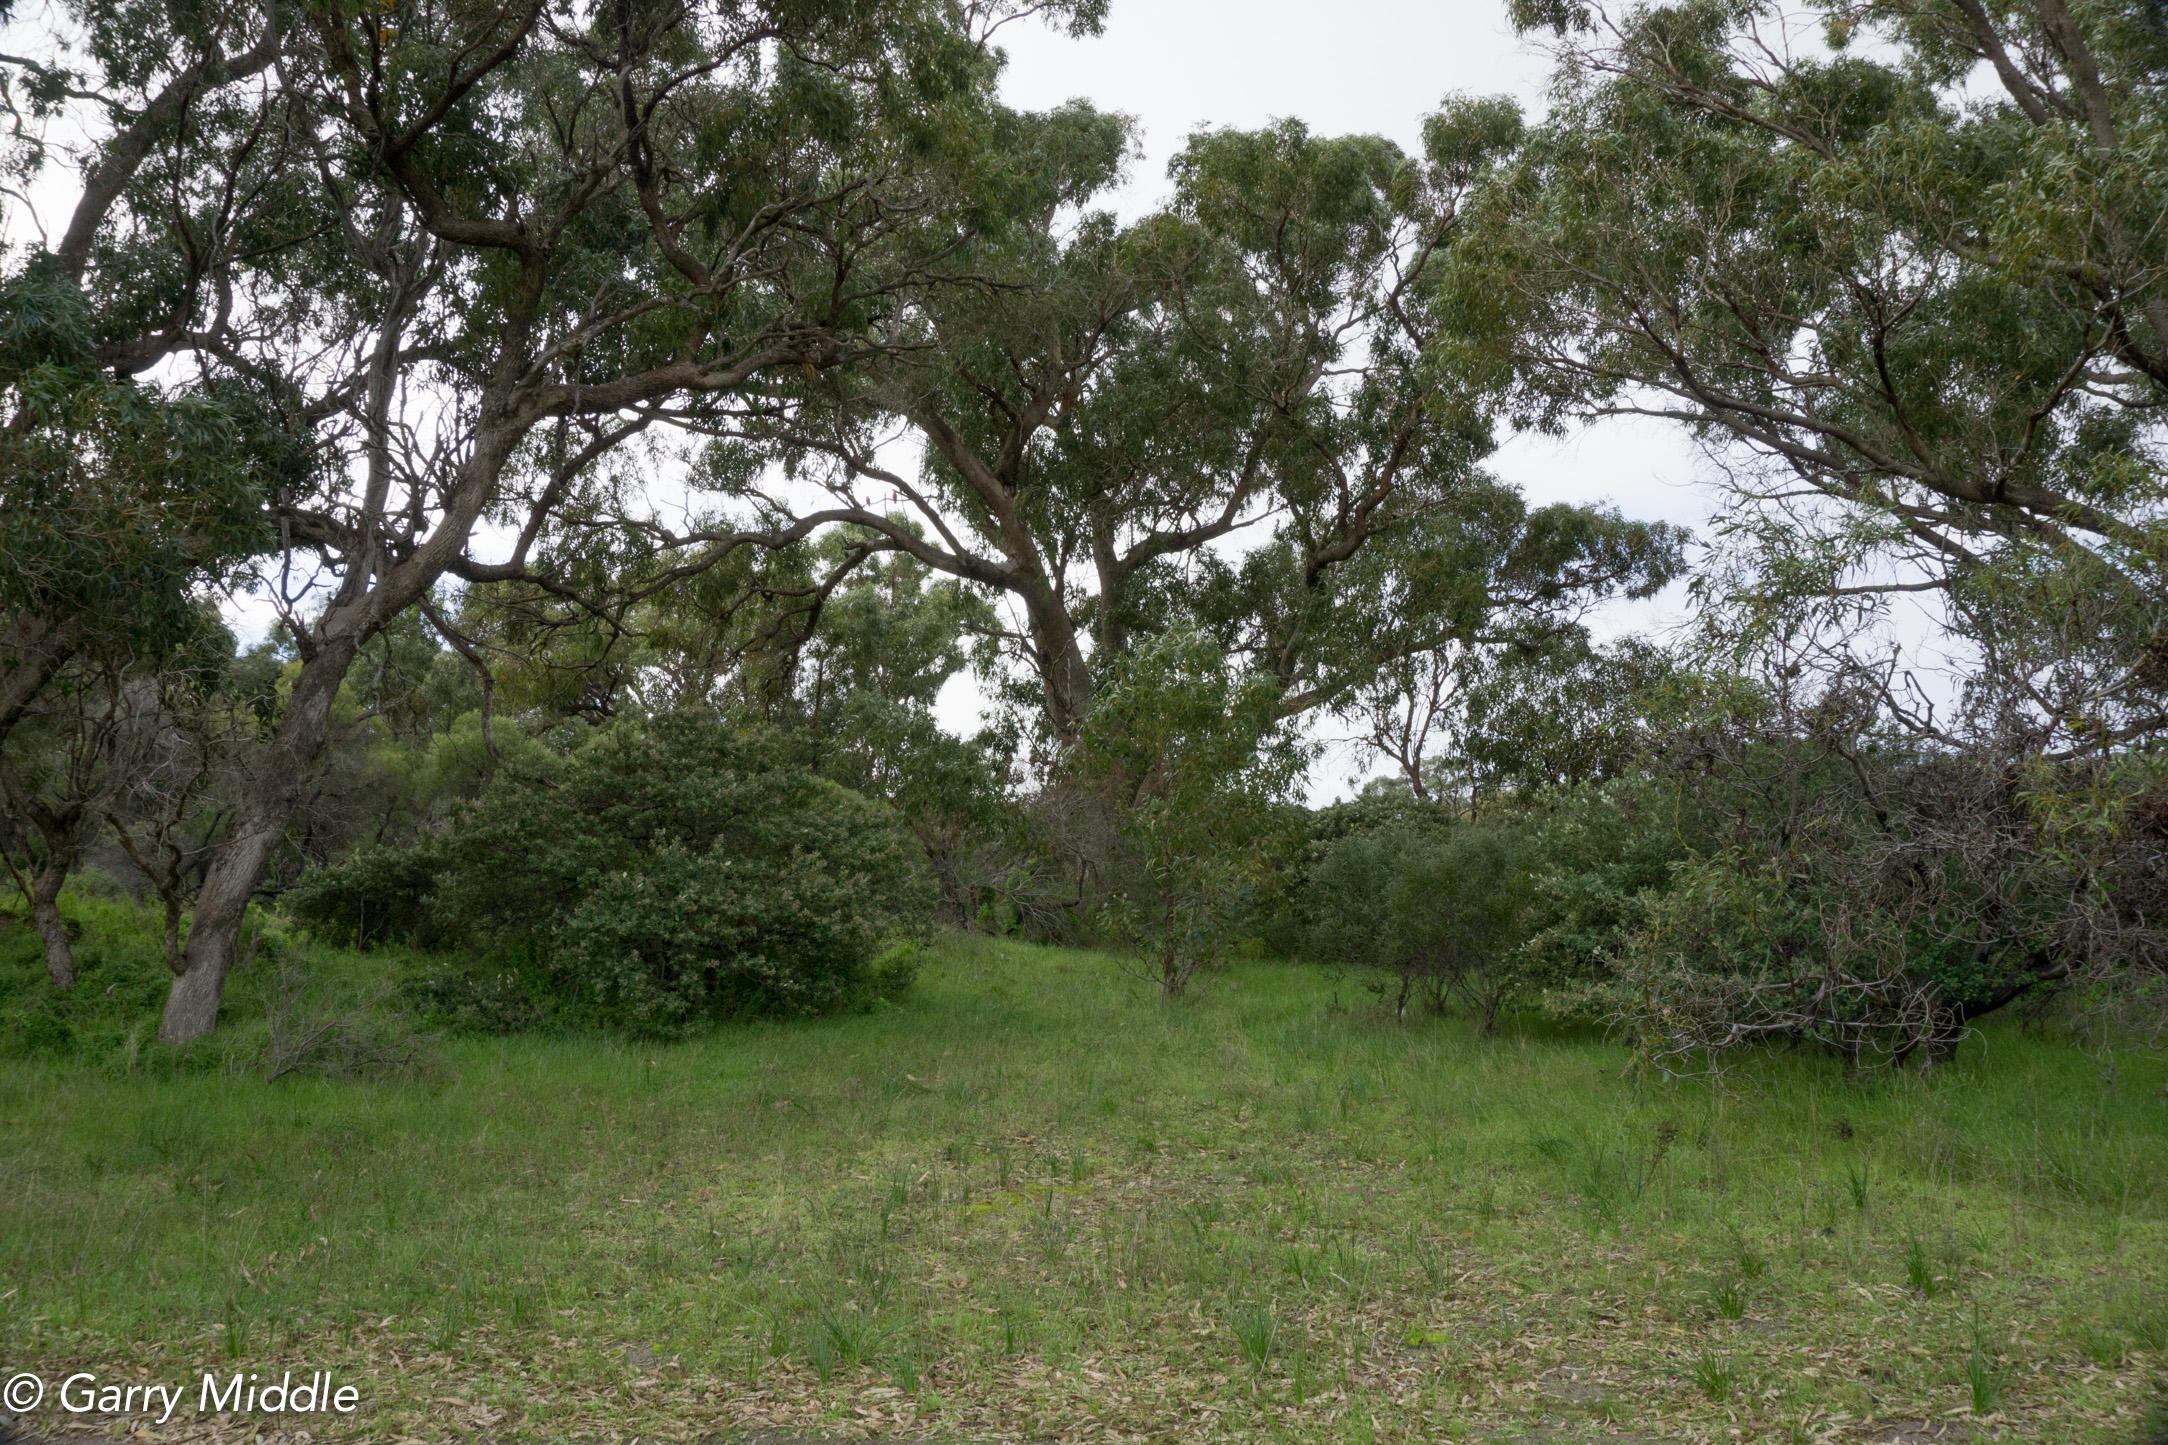 Plate 21: Tuart woodland